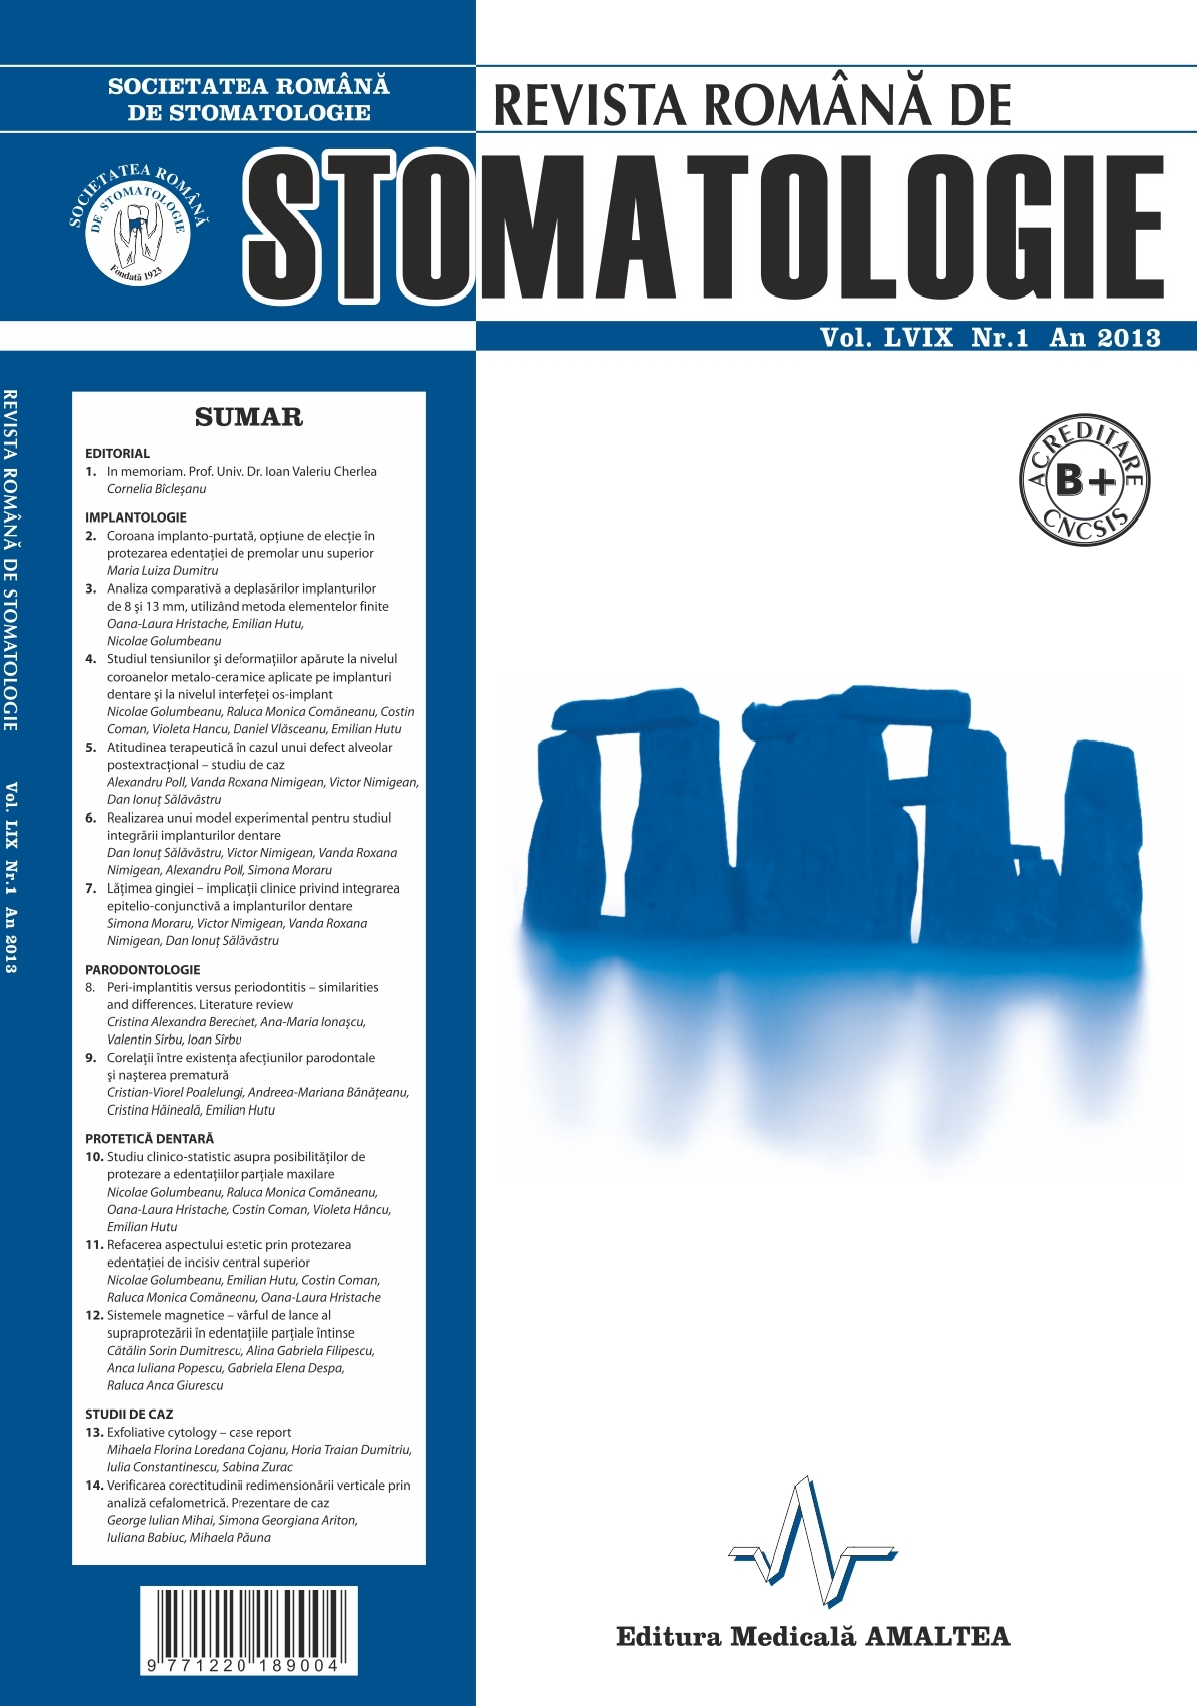 Revista Romana de STOMATOLOGIE - Romanian Journal of Stomatology, Vol. LIX, Nr. 1, An 2013